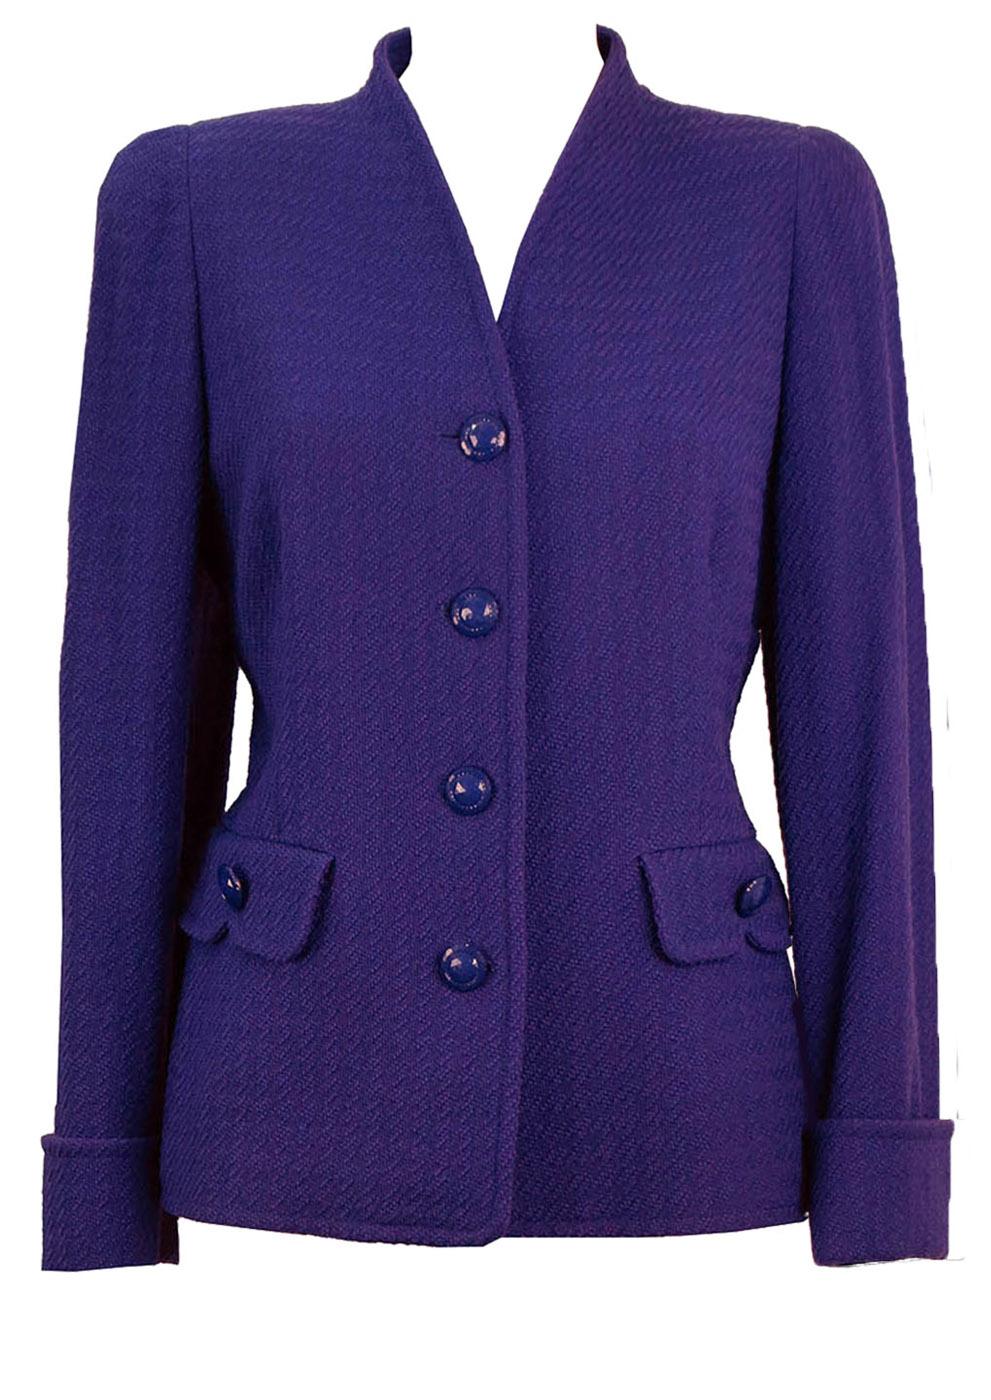 564a04f627 Luisa Spagnoli Pure Wool Violet Jacket – M – Reign Vintage